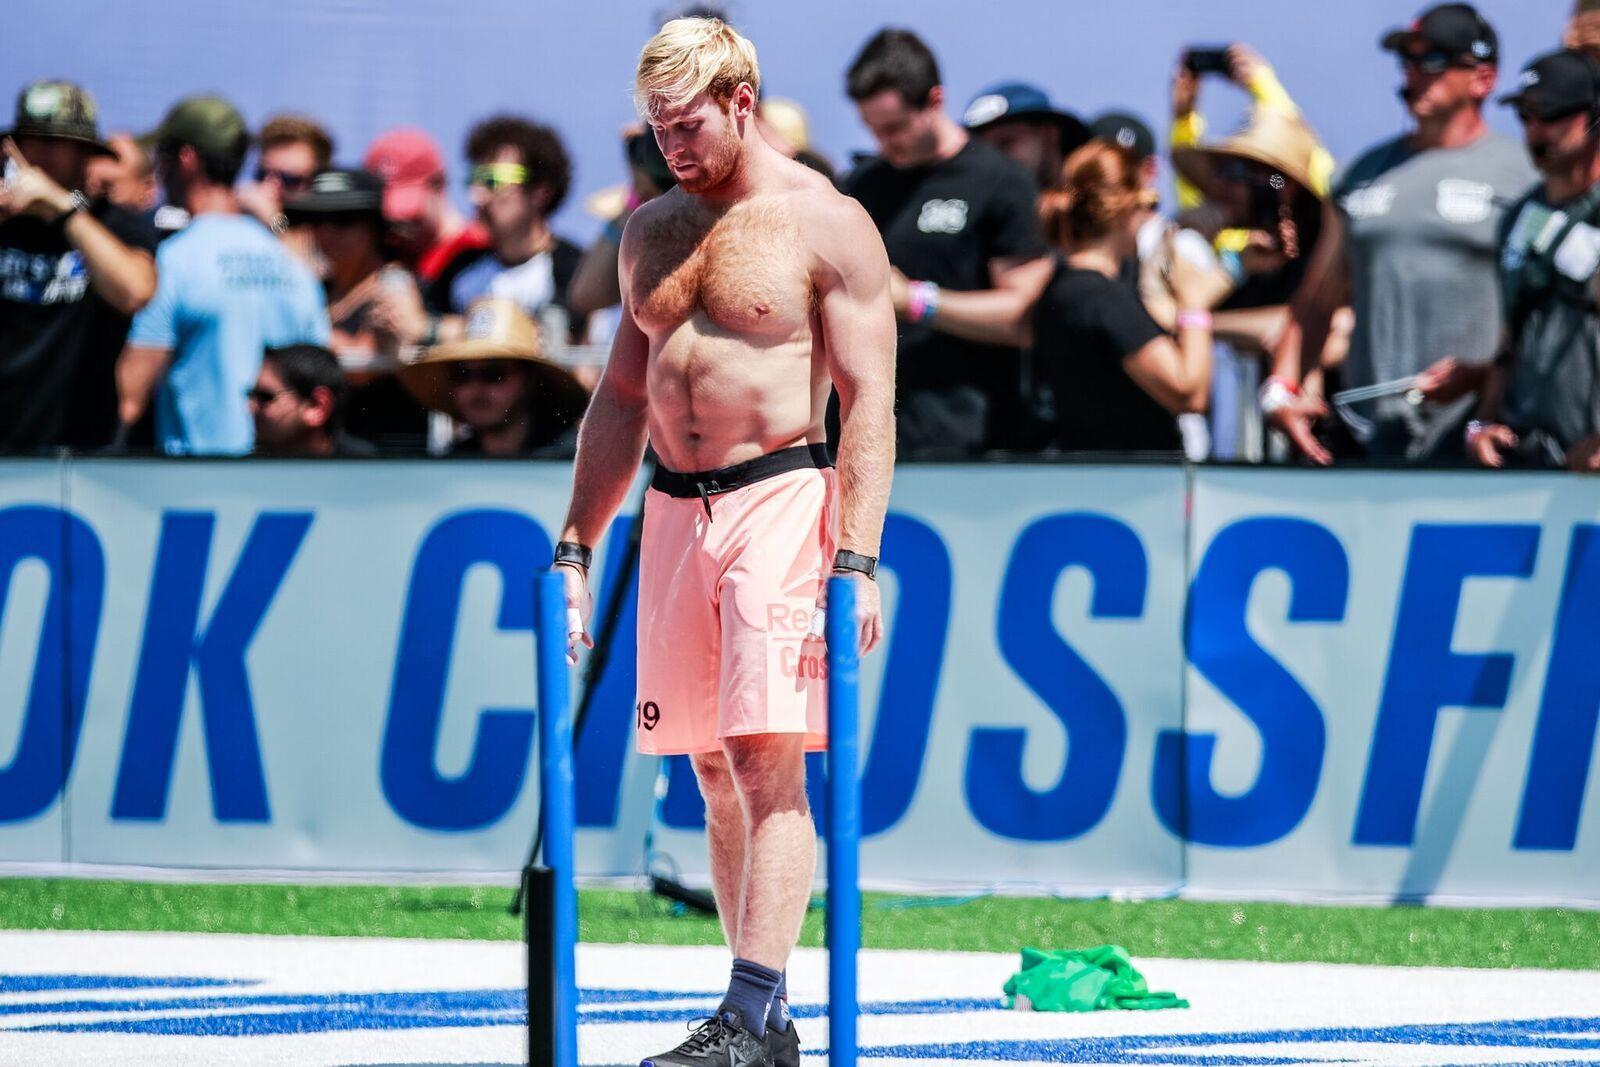 Here's Who the Big Winners Were at CrossFit's Wodapalooza